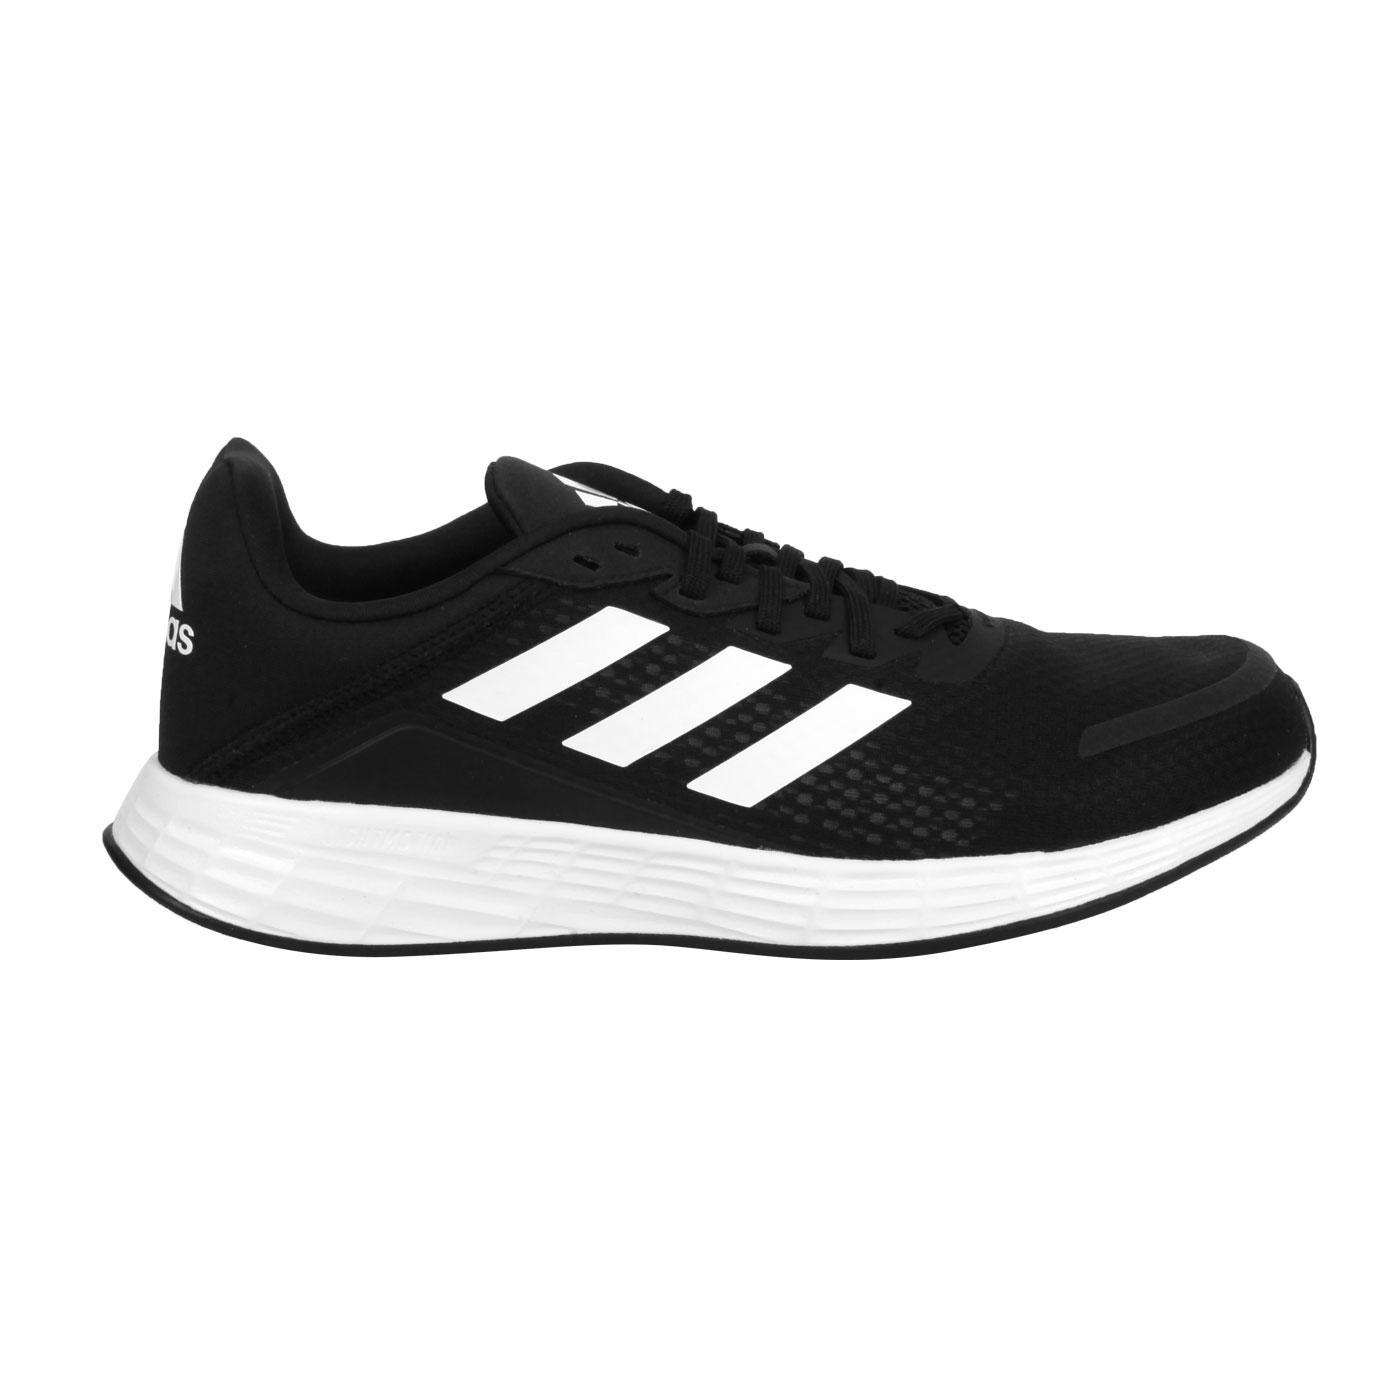 ADIDAS 男款休閒運動鞋  @DURAMO SL@GV7124 - 黑白